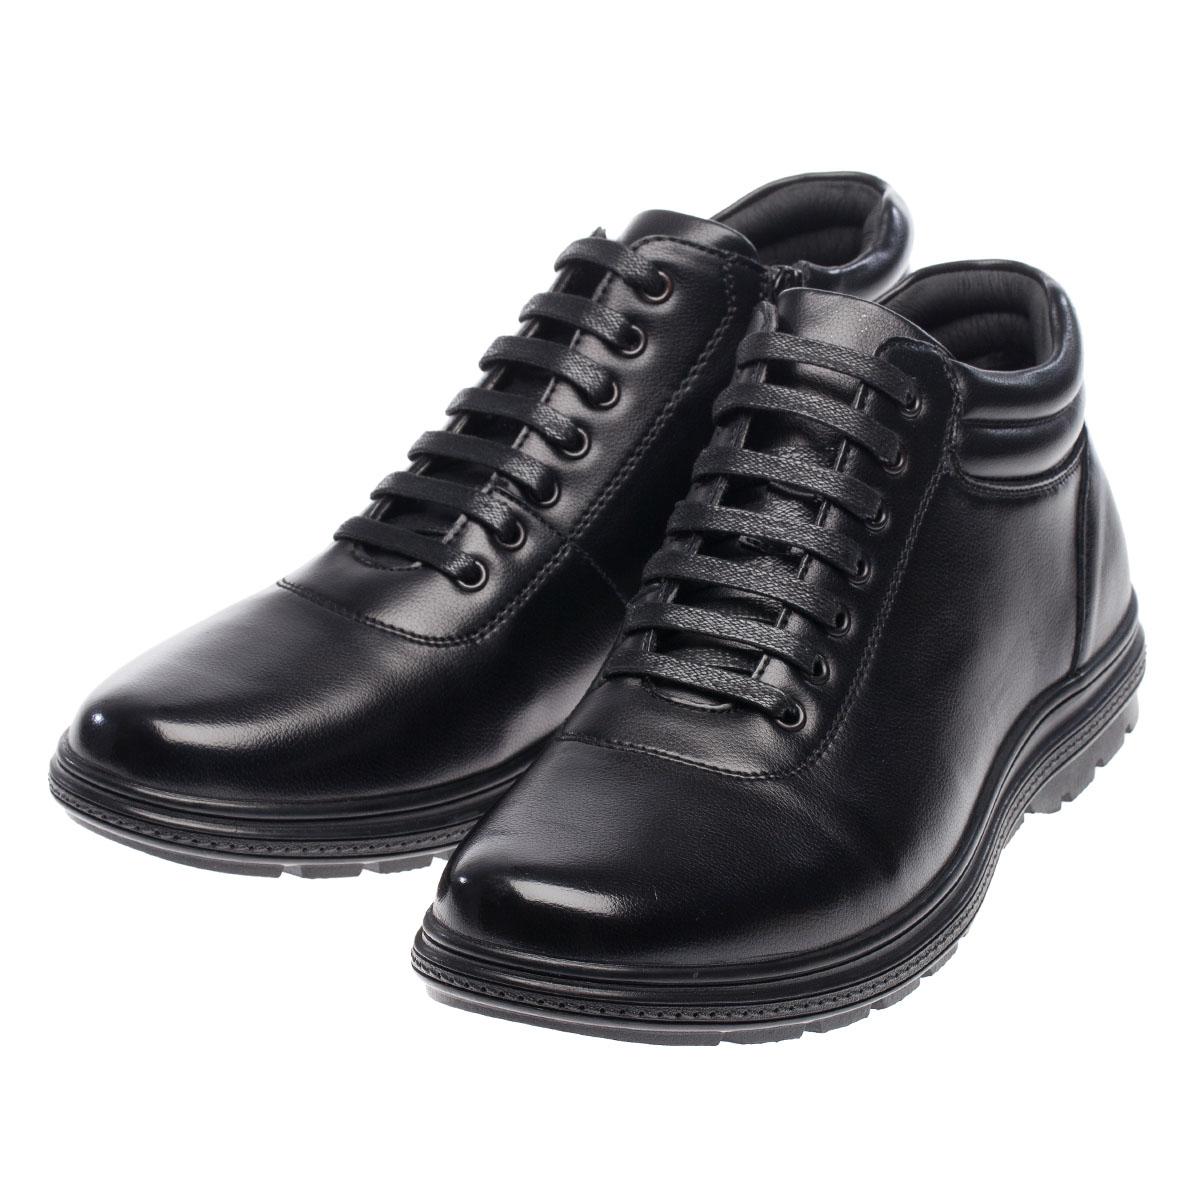 Ботинки демисезонные FERTO, M026-1